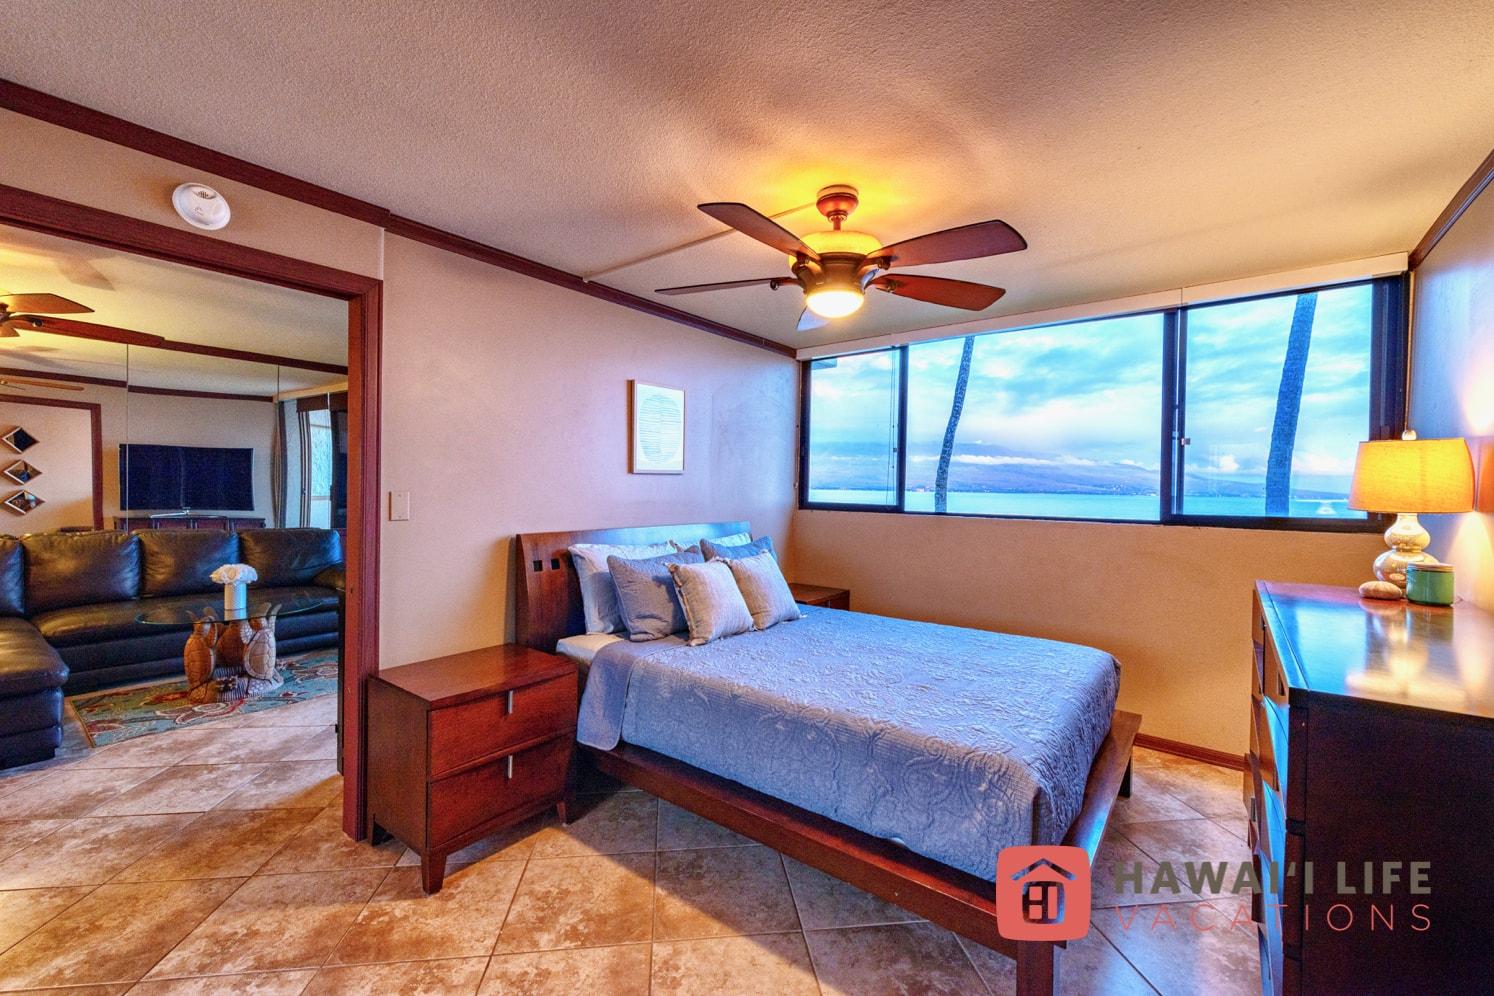 Kanai A Nalu Maui Vacation Rental - Master Bedroom